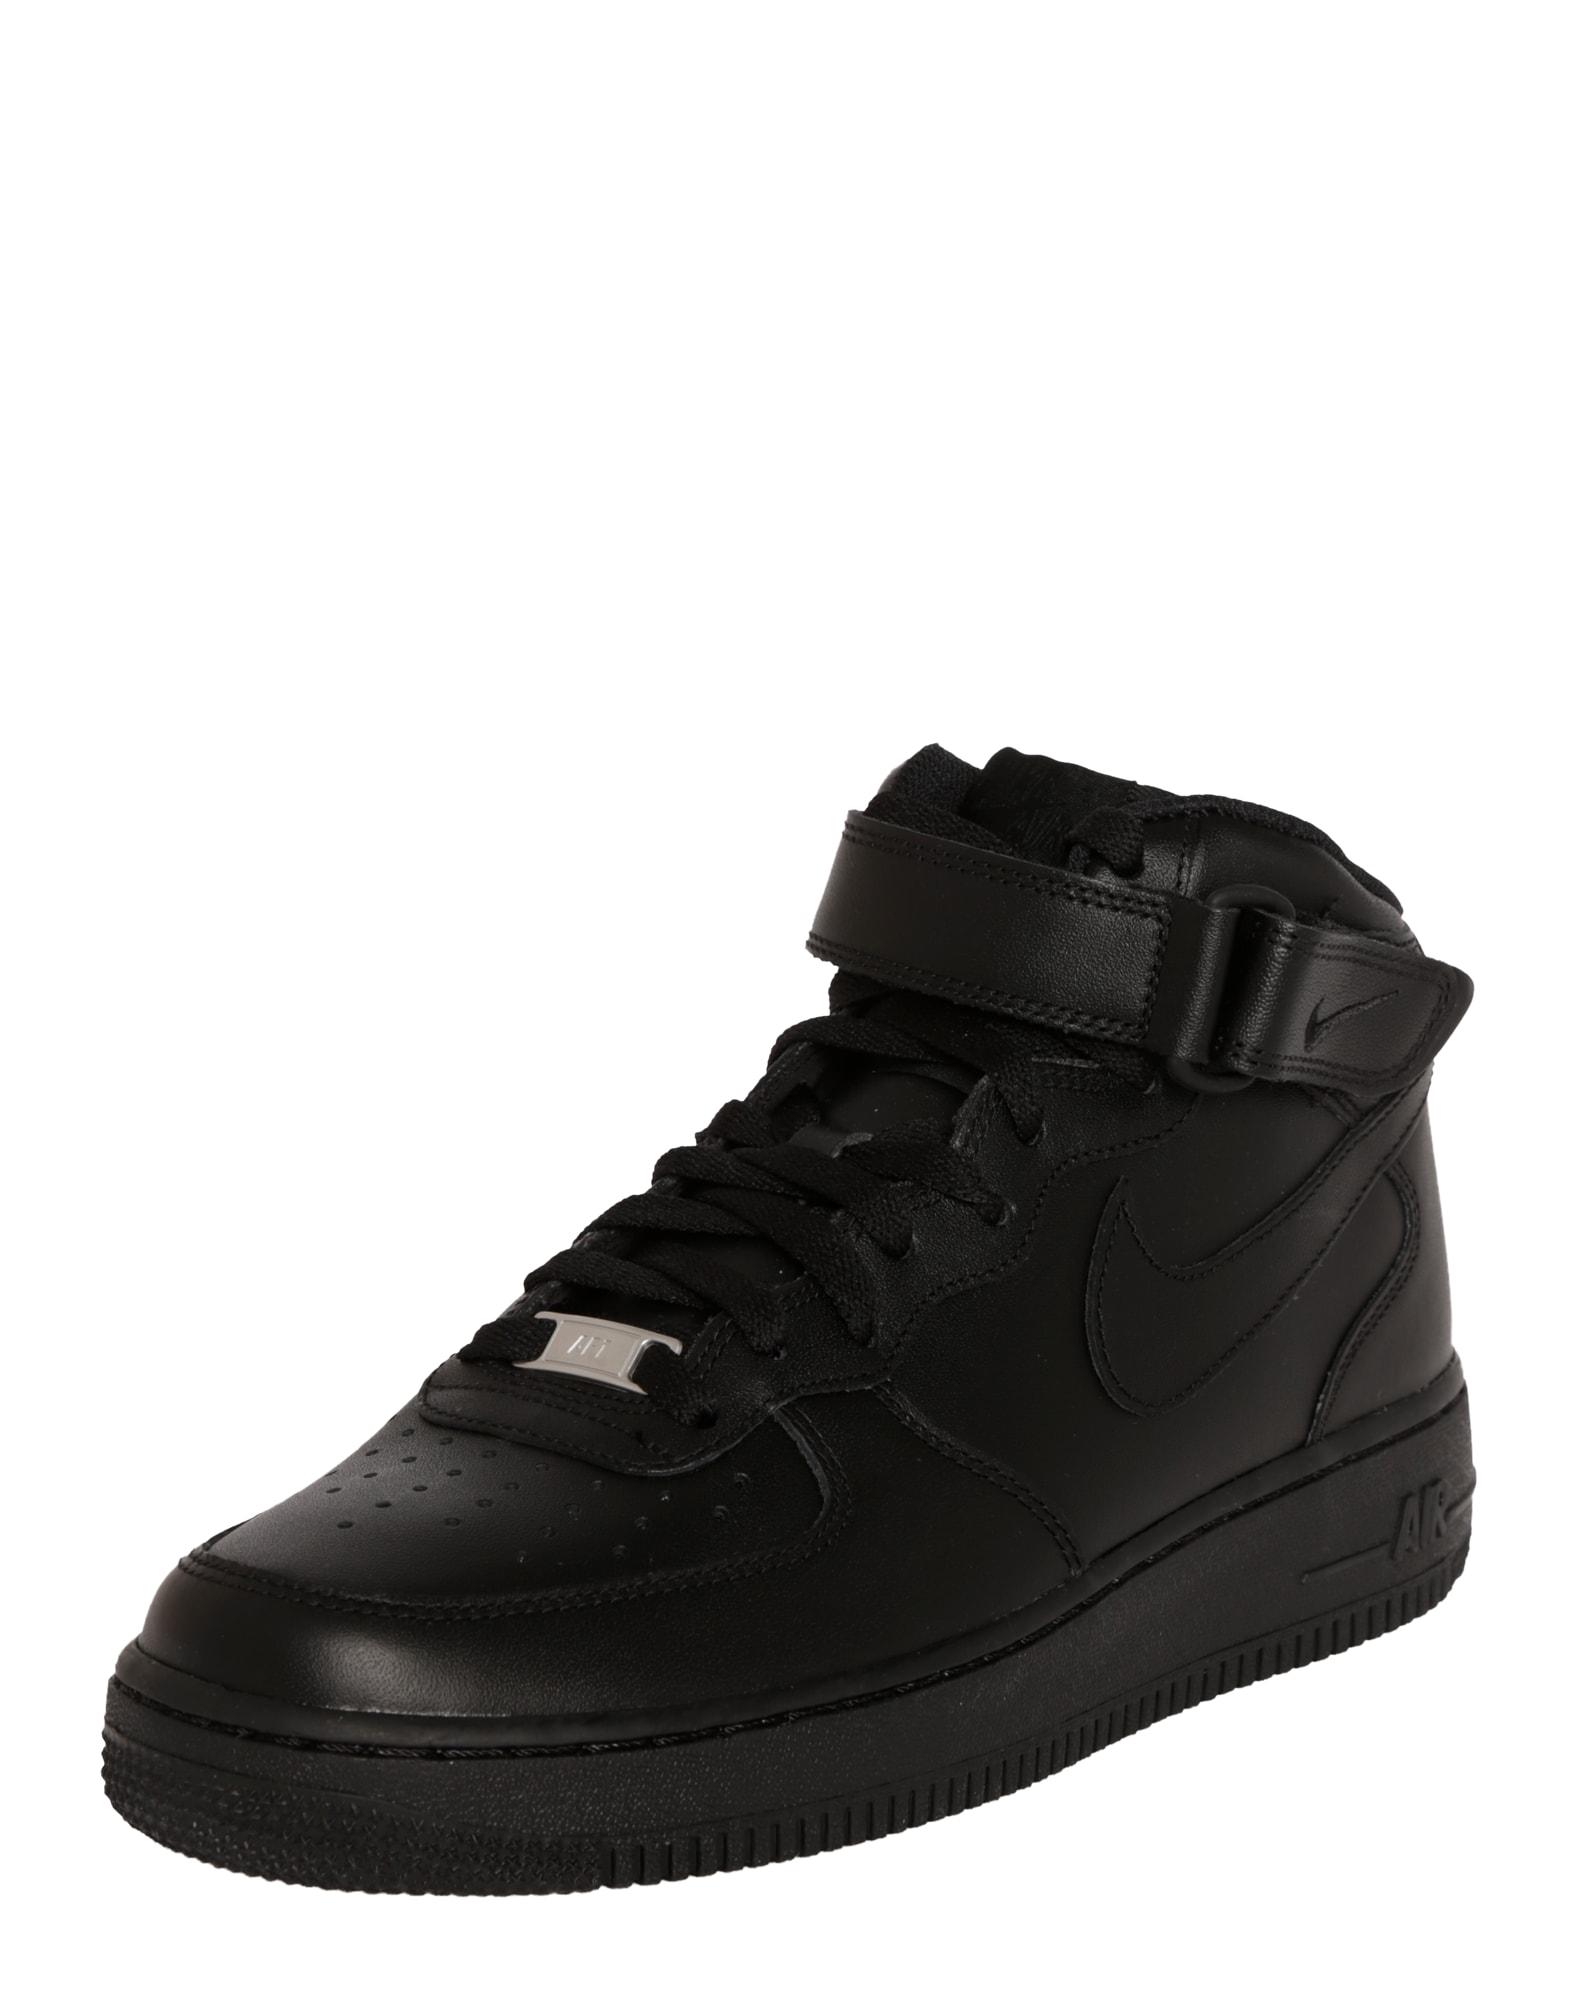 Nike Sportswear Členkové tenisky 'Air Force Mid'  čierna